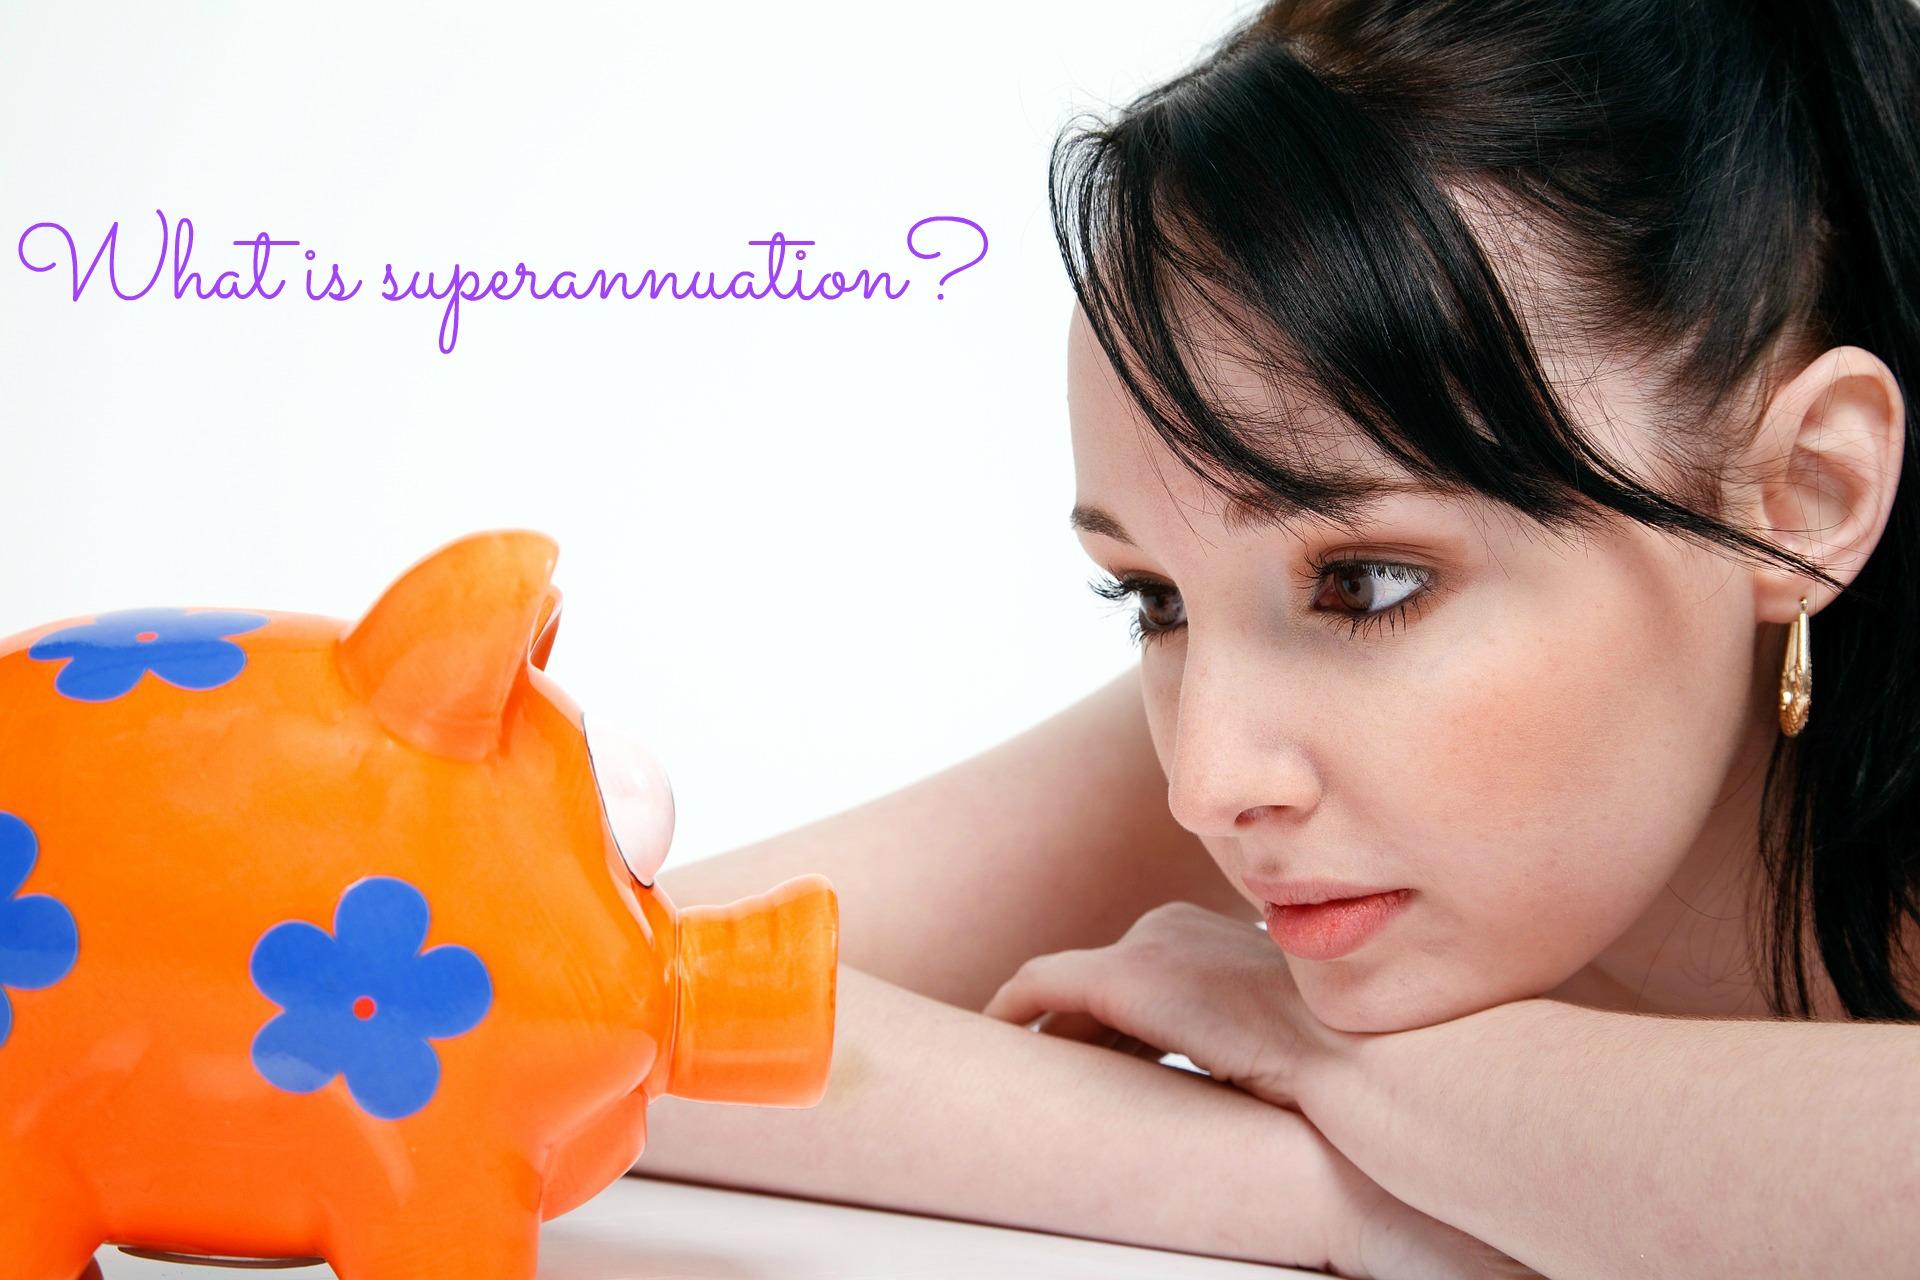 what is superannuation